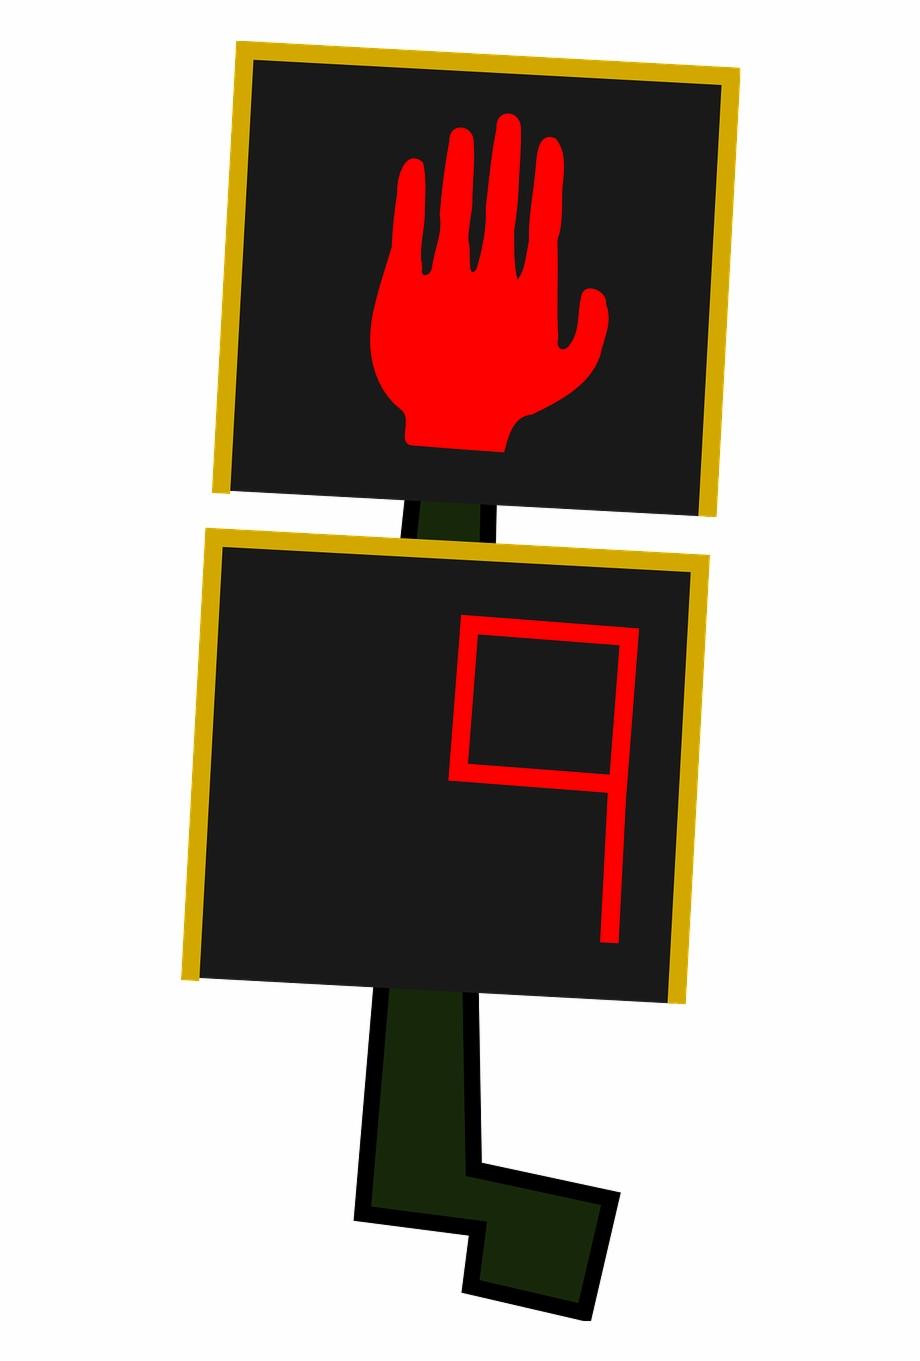 Wait crossing light clipart jpg free stock Crossing Crosswalk Pedestrian Png Image - Wait Crosswalk ... jpg free stock